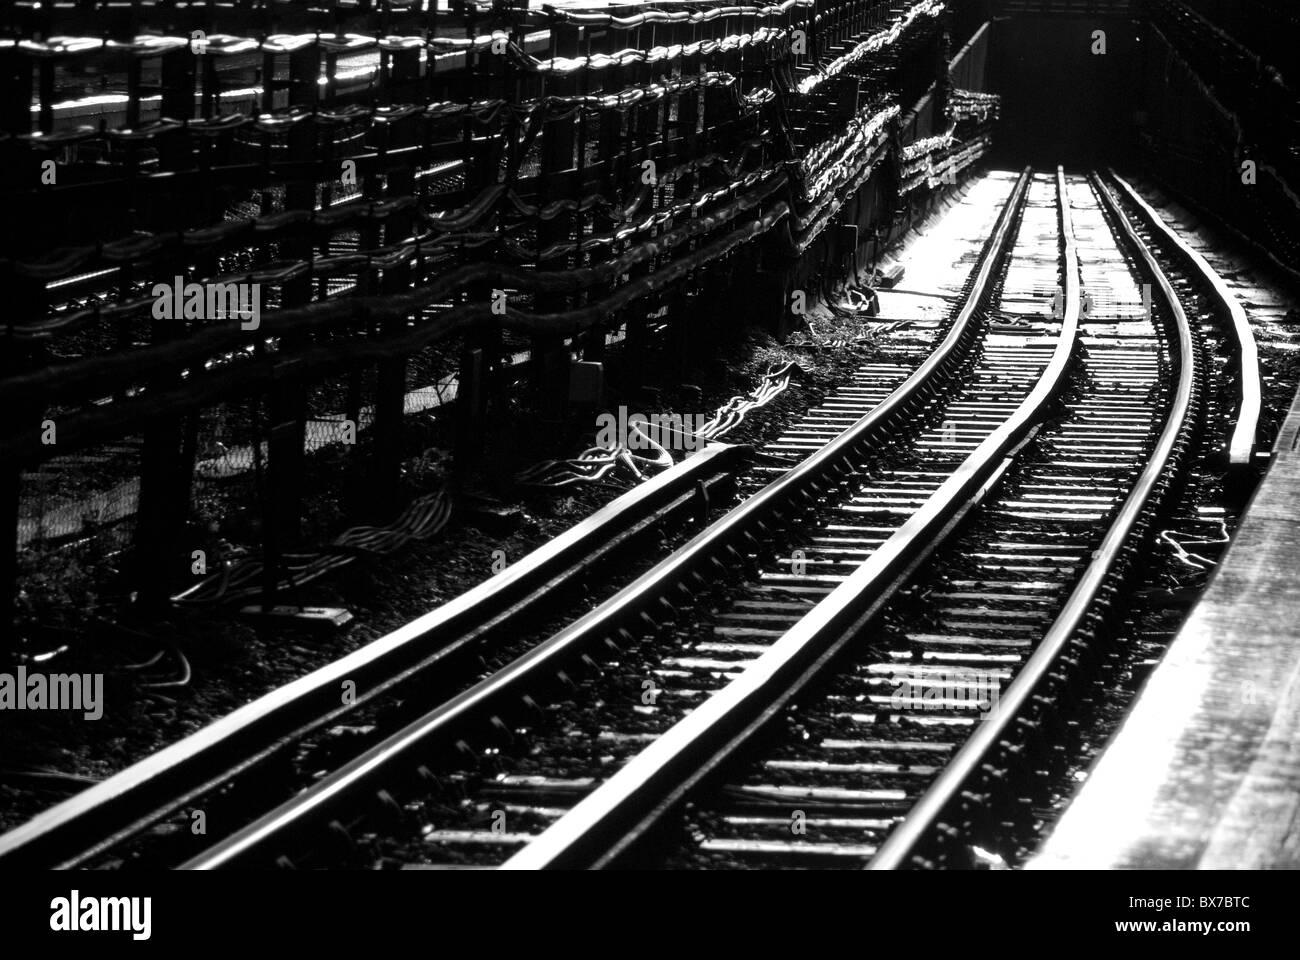 Rail tracks - Stock Image